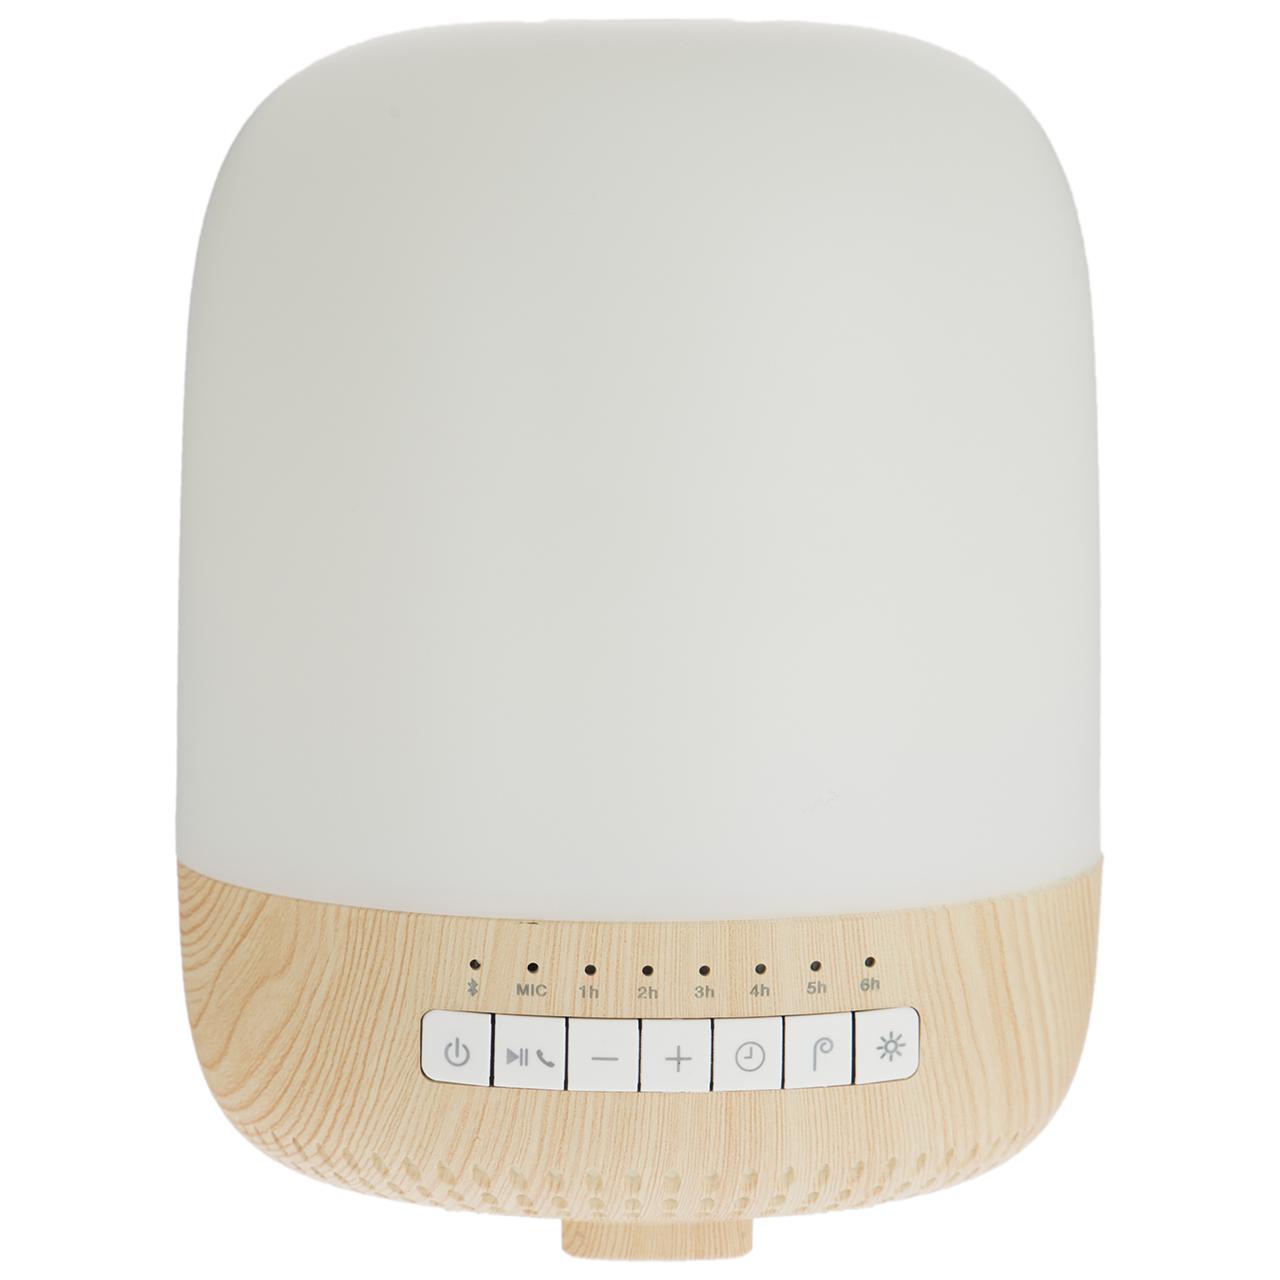 اسپیکر بلوتوثی و لامپ هوشمند ایمویی مدل H0027 H05